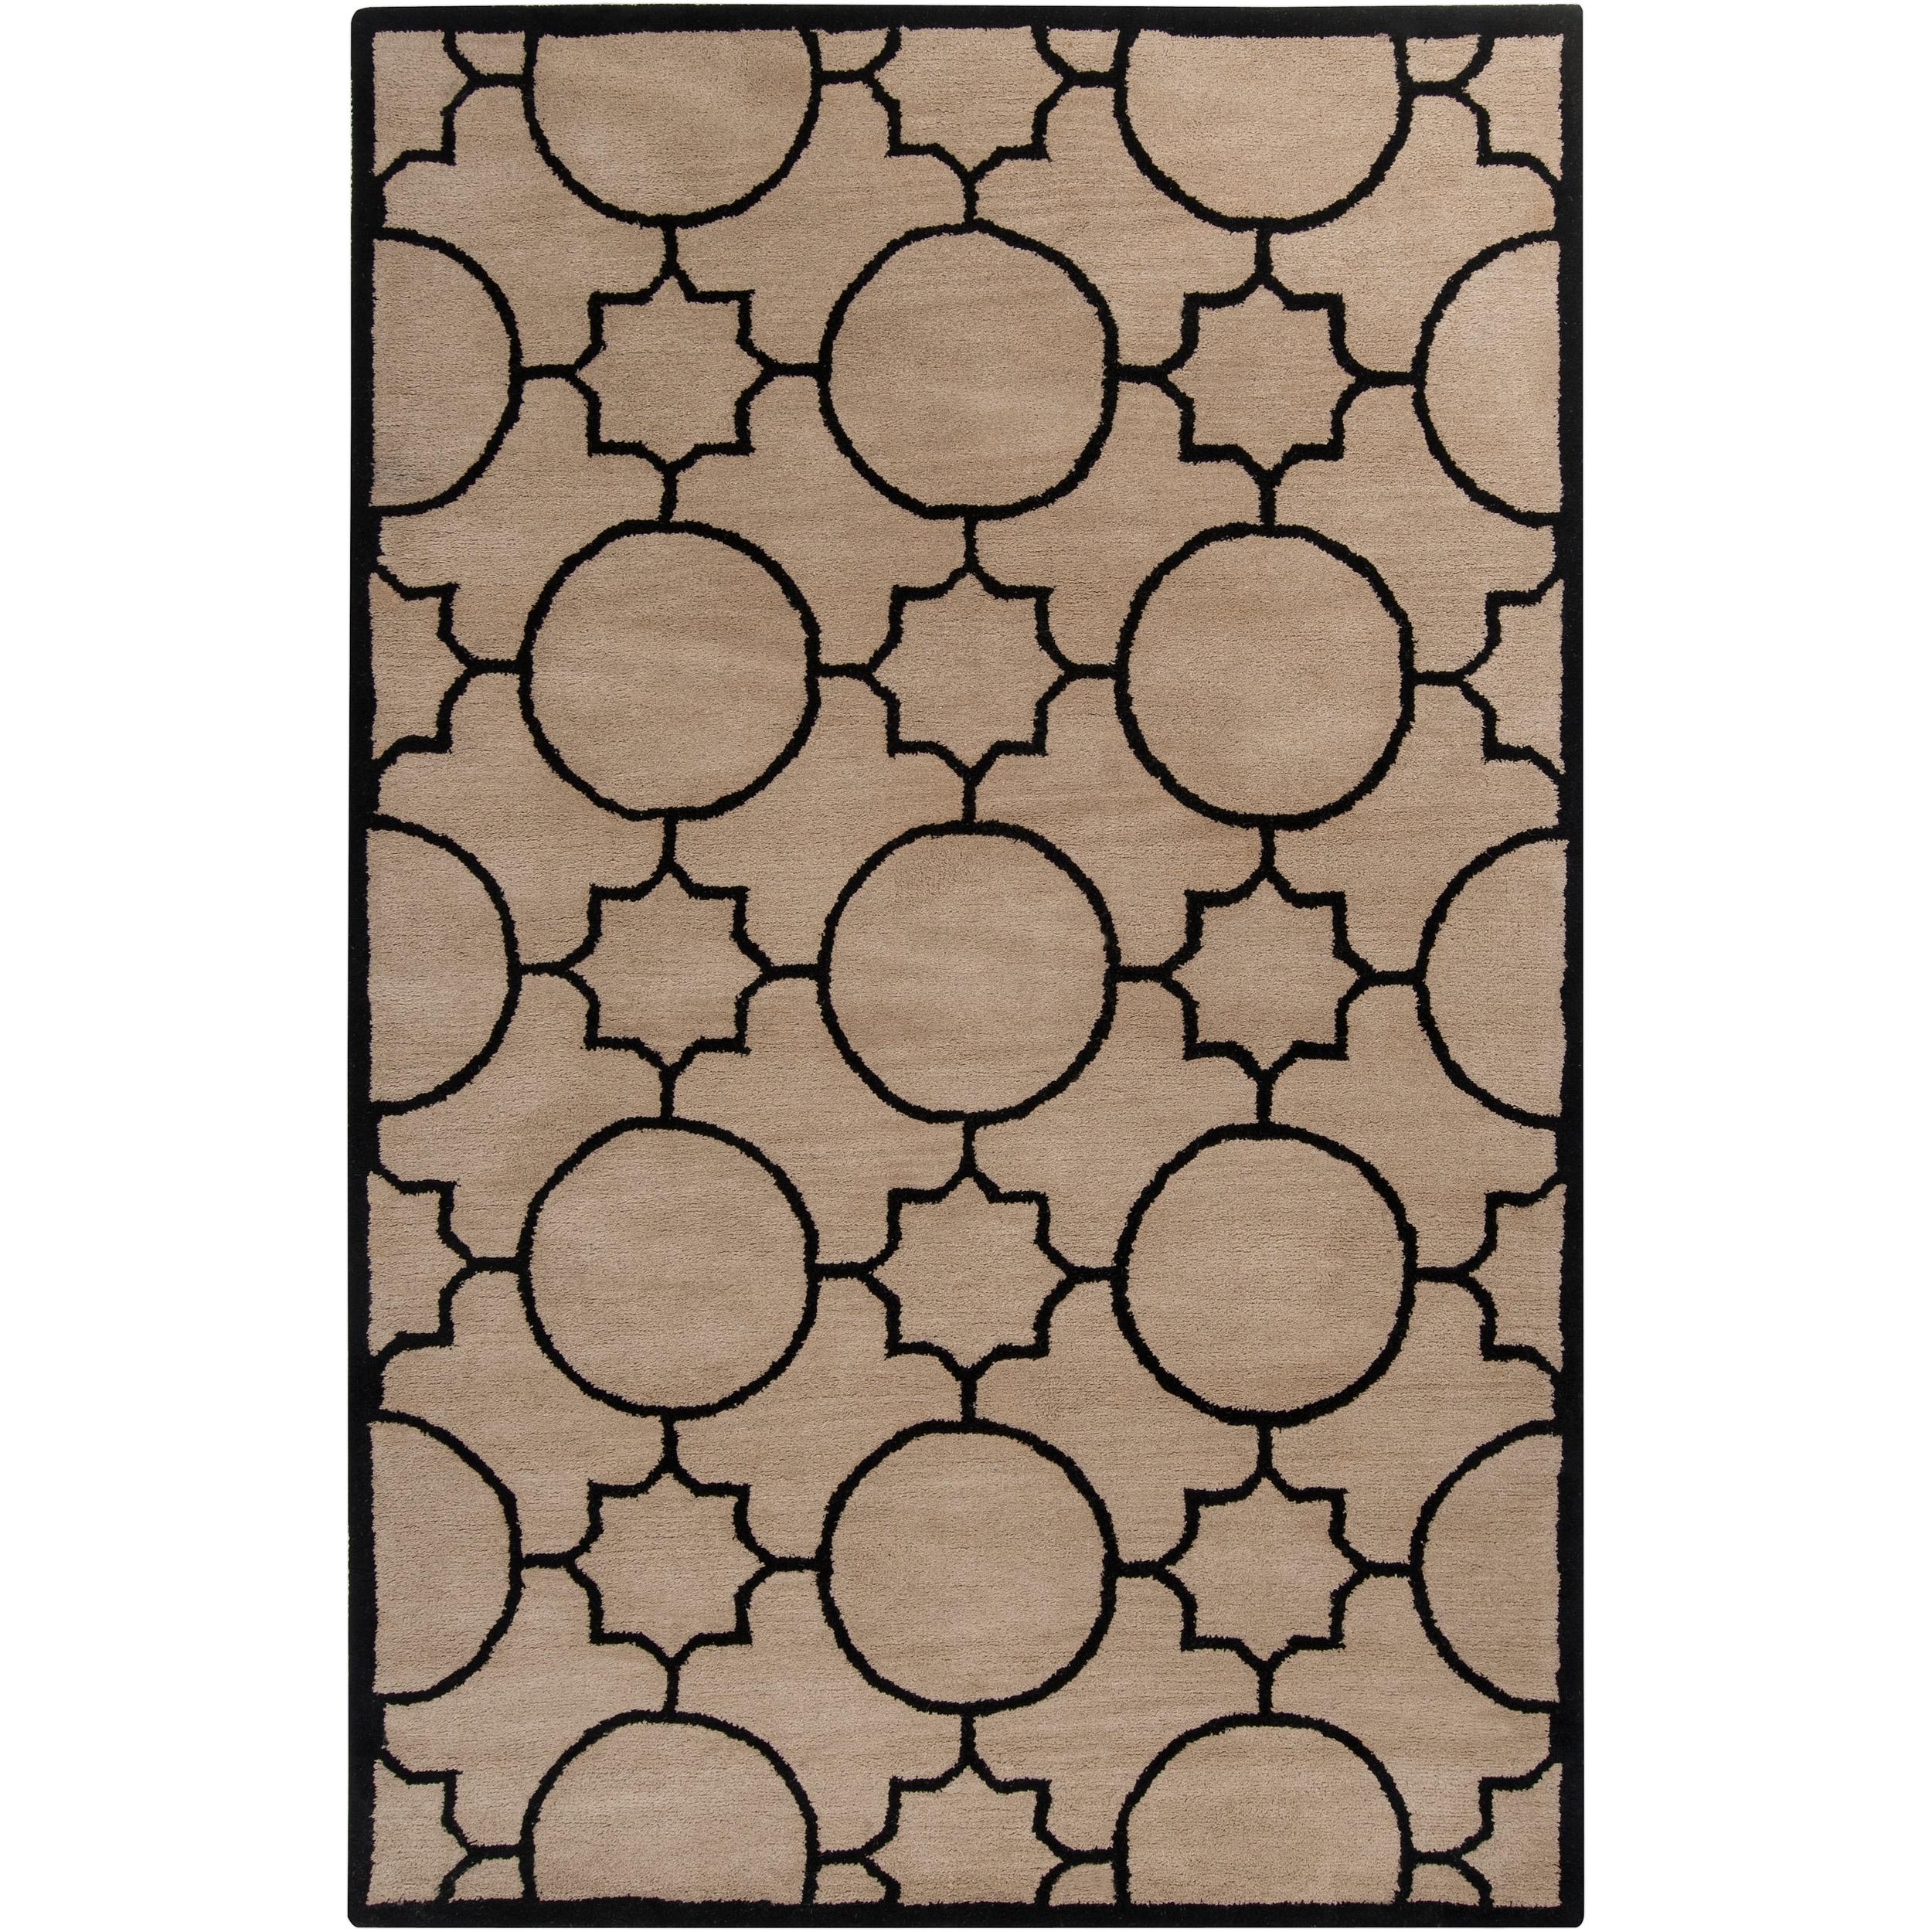 Hand tufted Oscar Black Wool Area Rug (3'6 x 5'6)